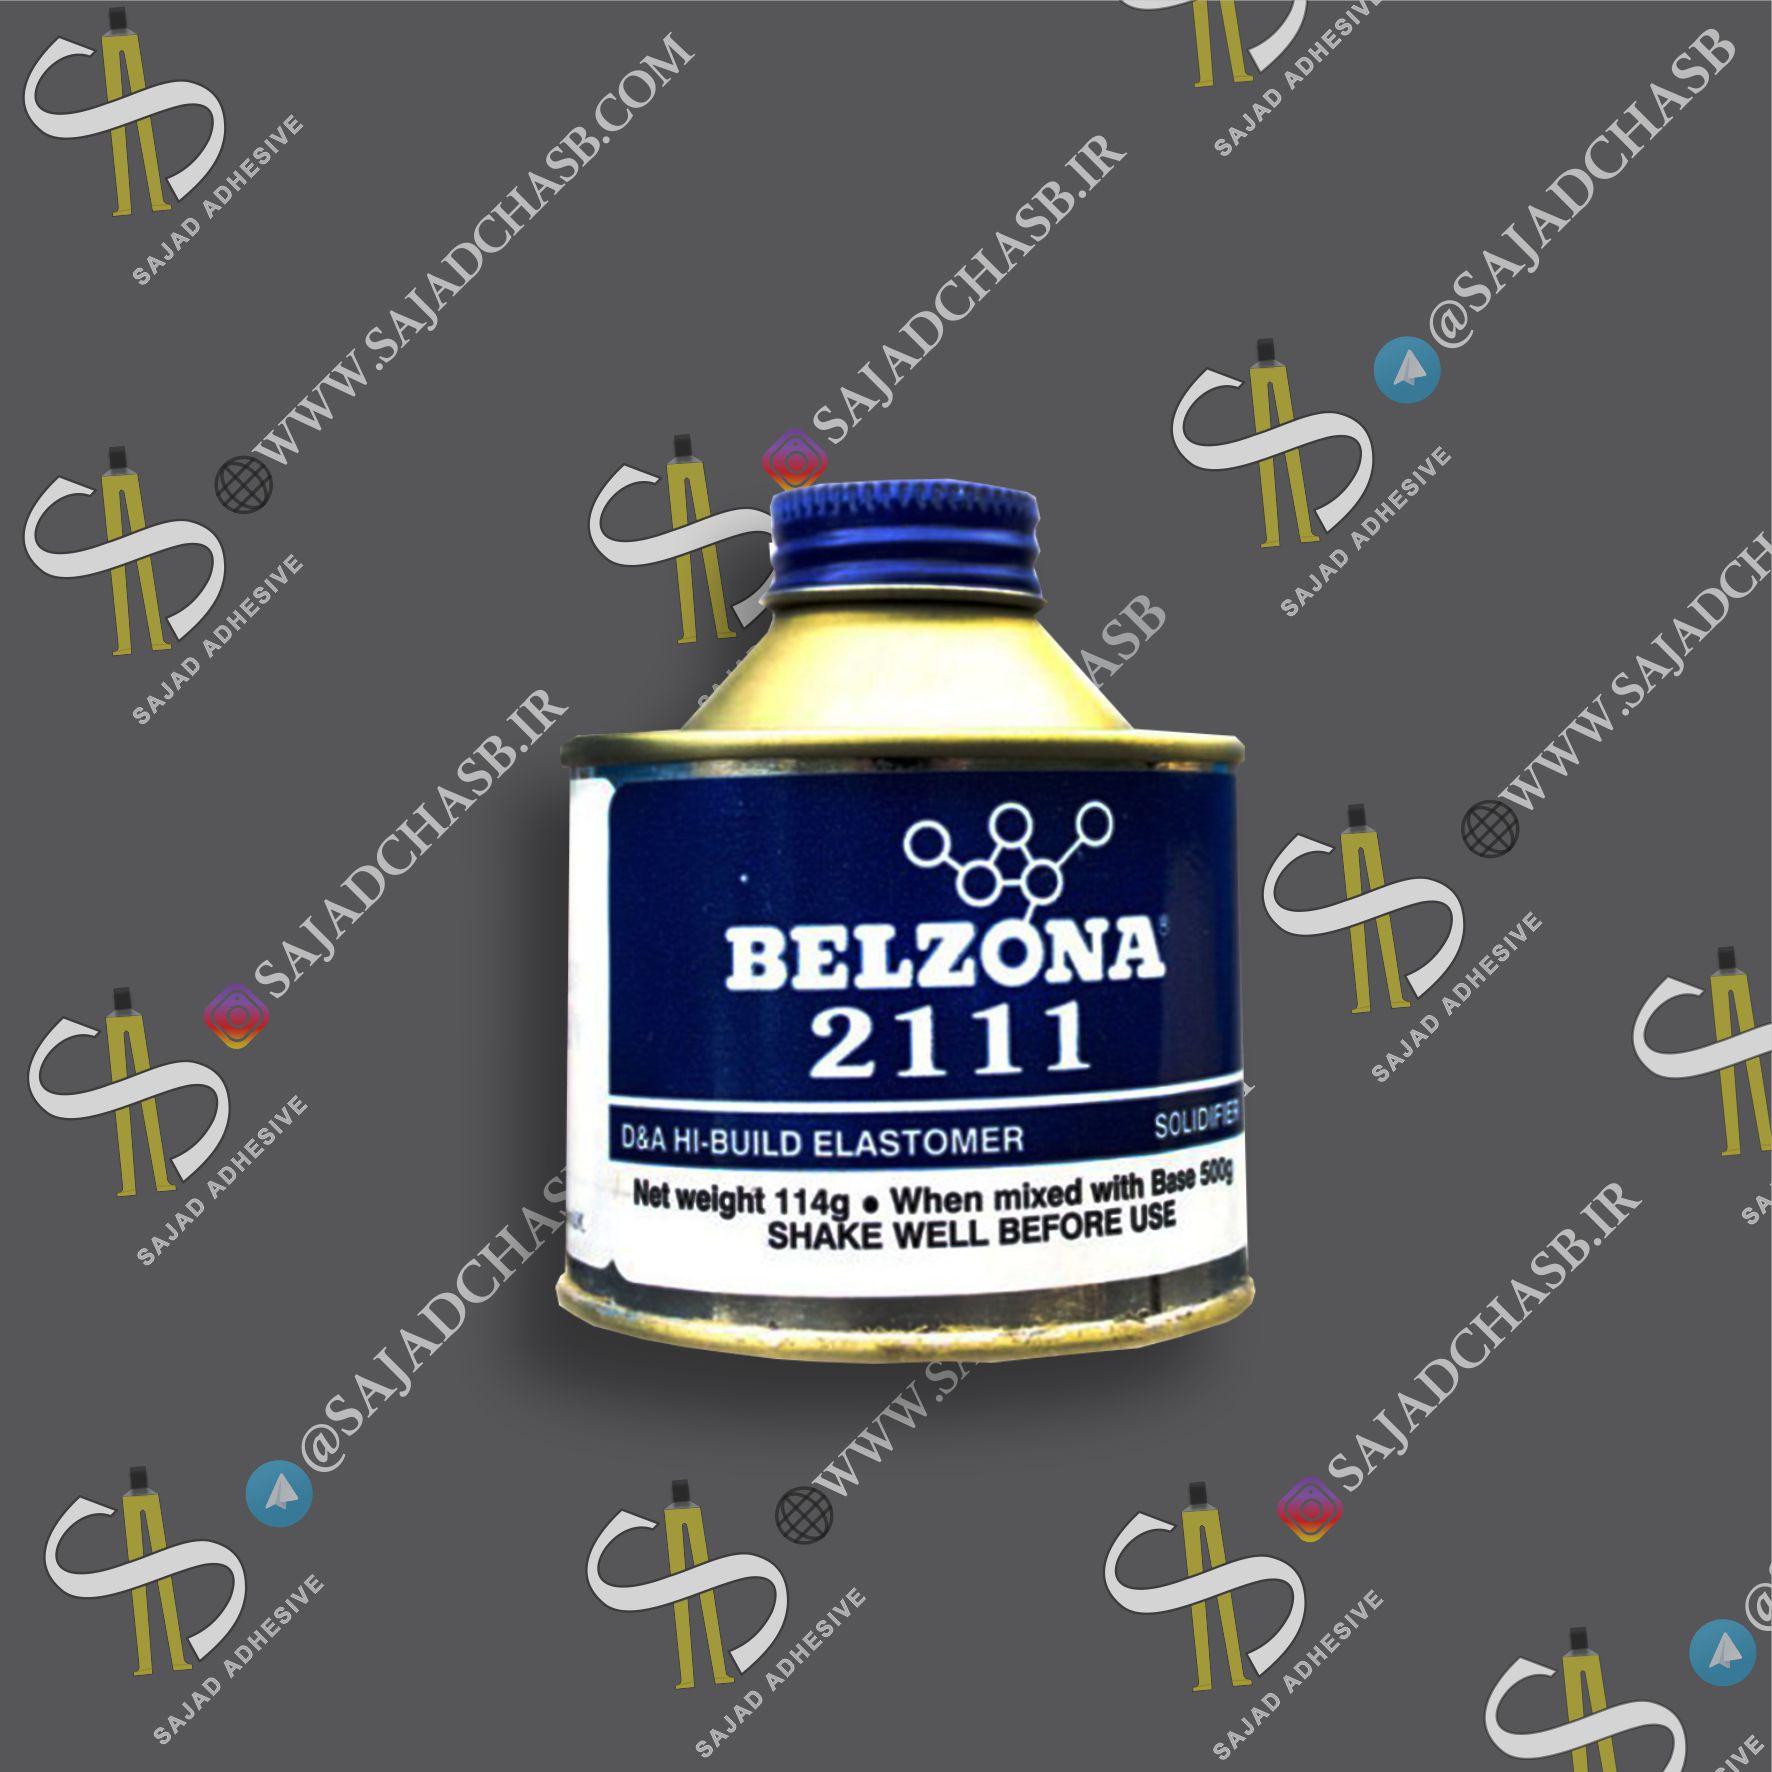 چسب اپوکسی BELZONA 2111